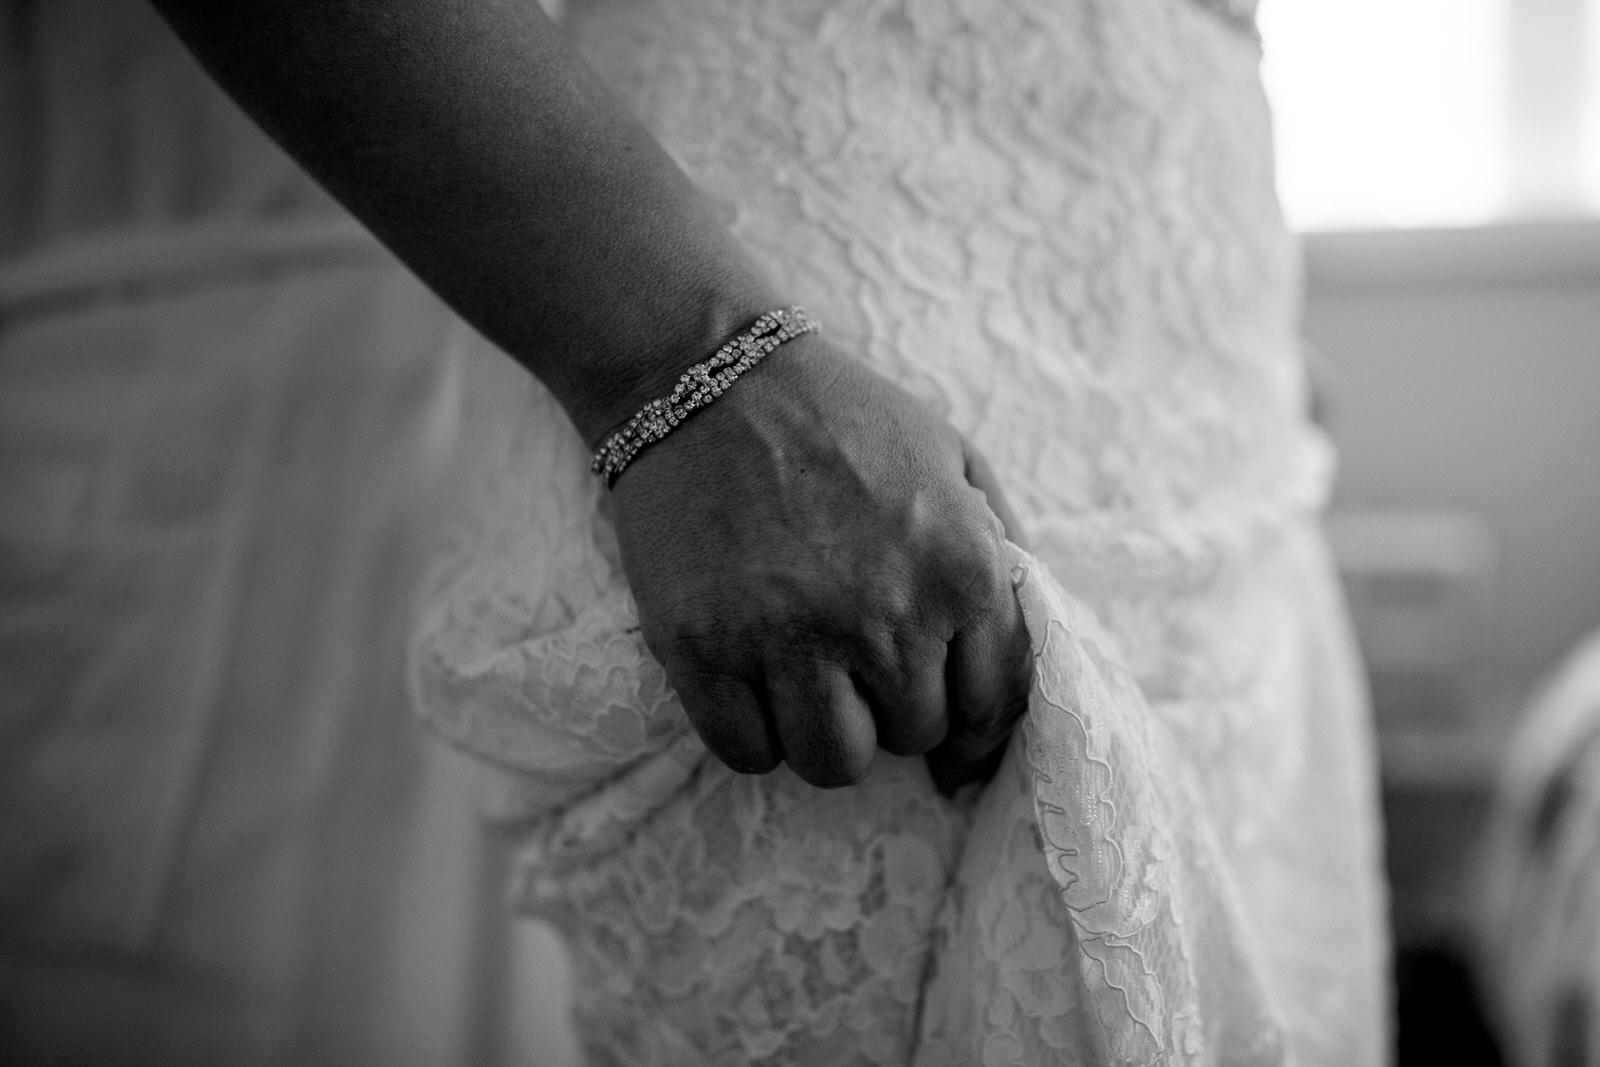 palmetto_bay_florida_backyard_wedding_tiny_house_photo-208.jpg